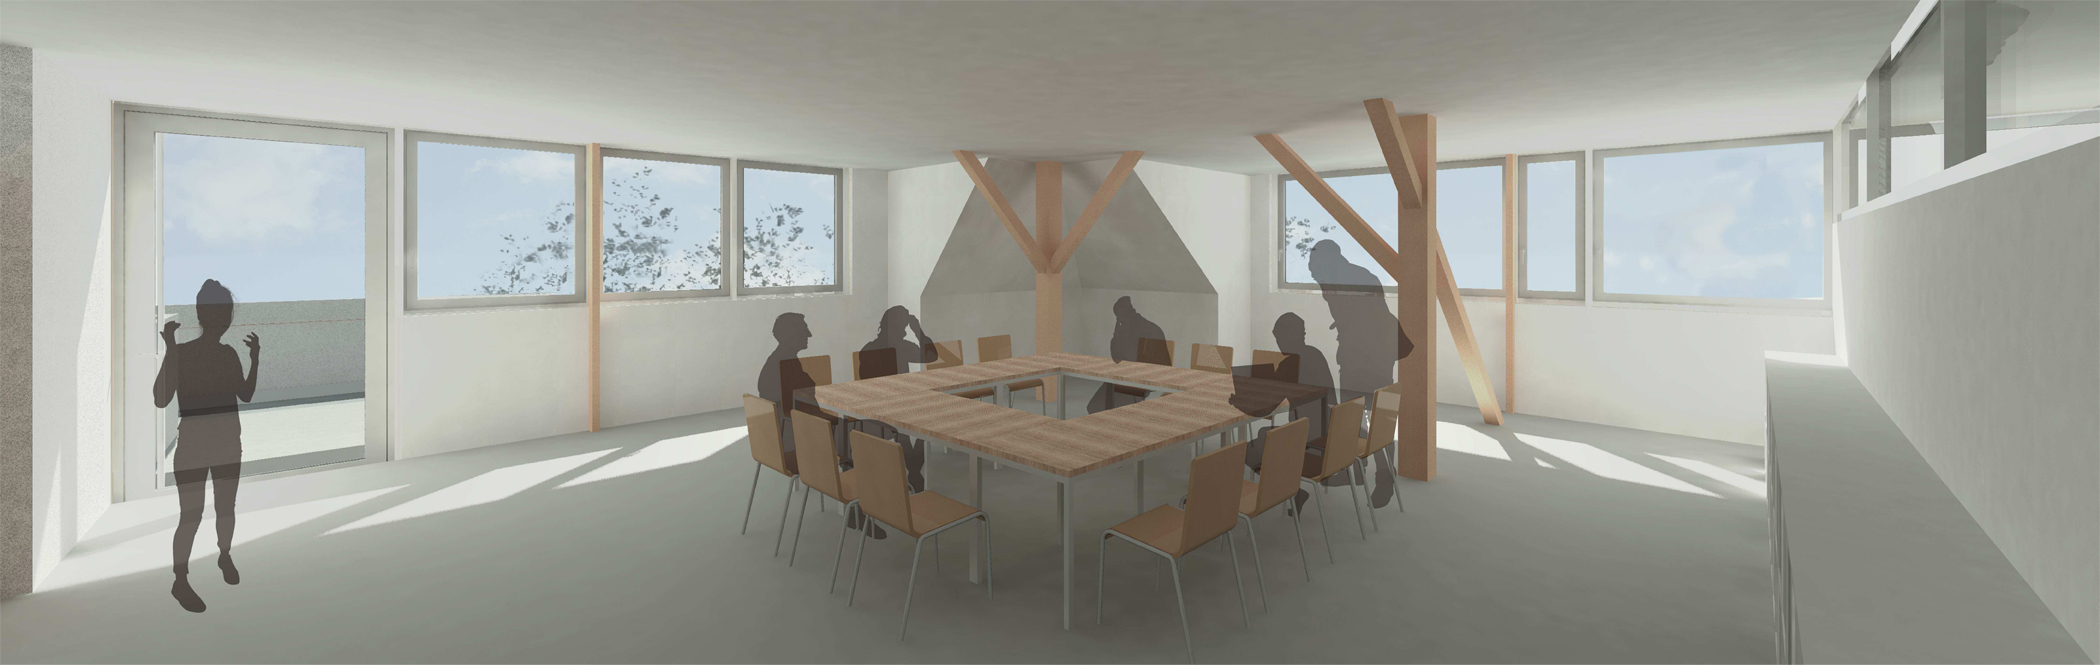 17-08 Ev. Schule Hochkirch_Perspektive Projektraum